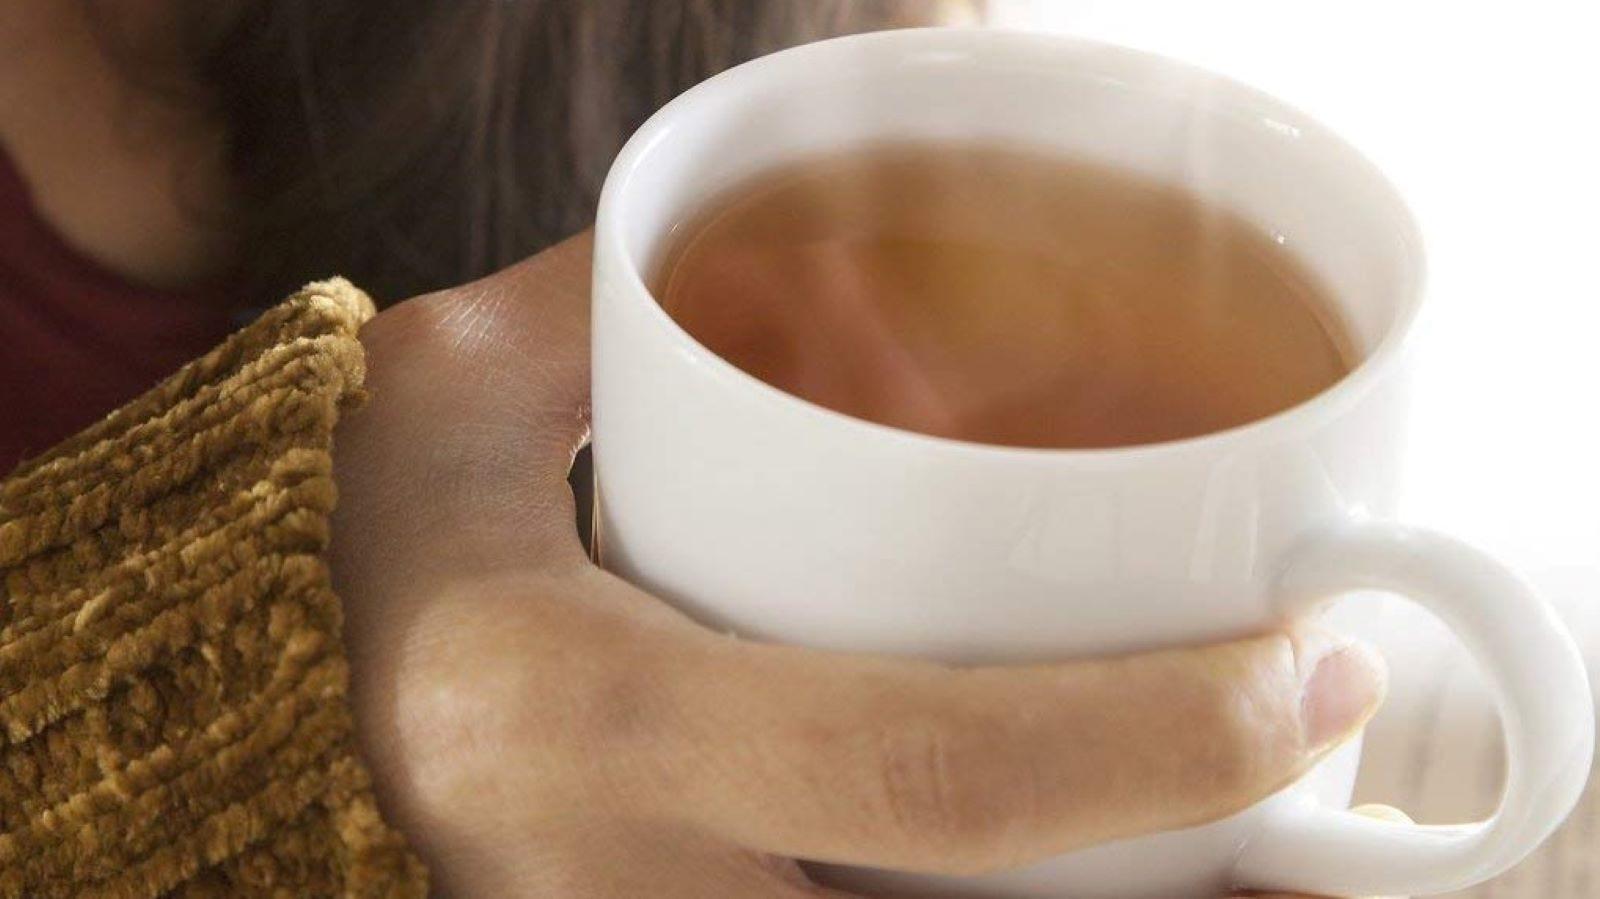 A woman holding a mug of rooibos tea.